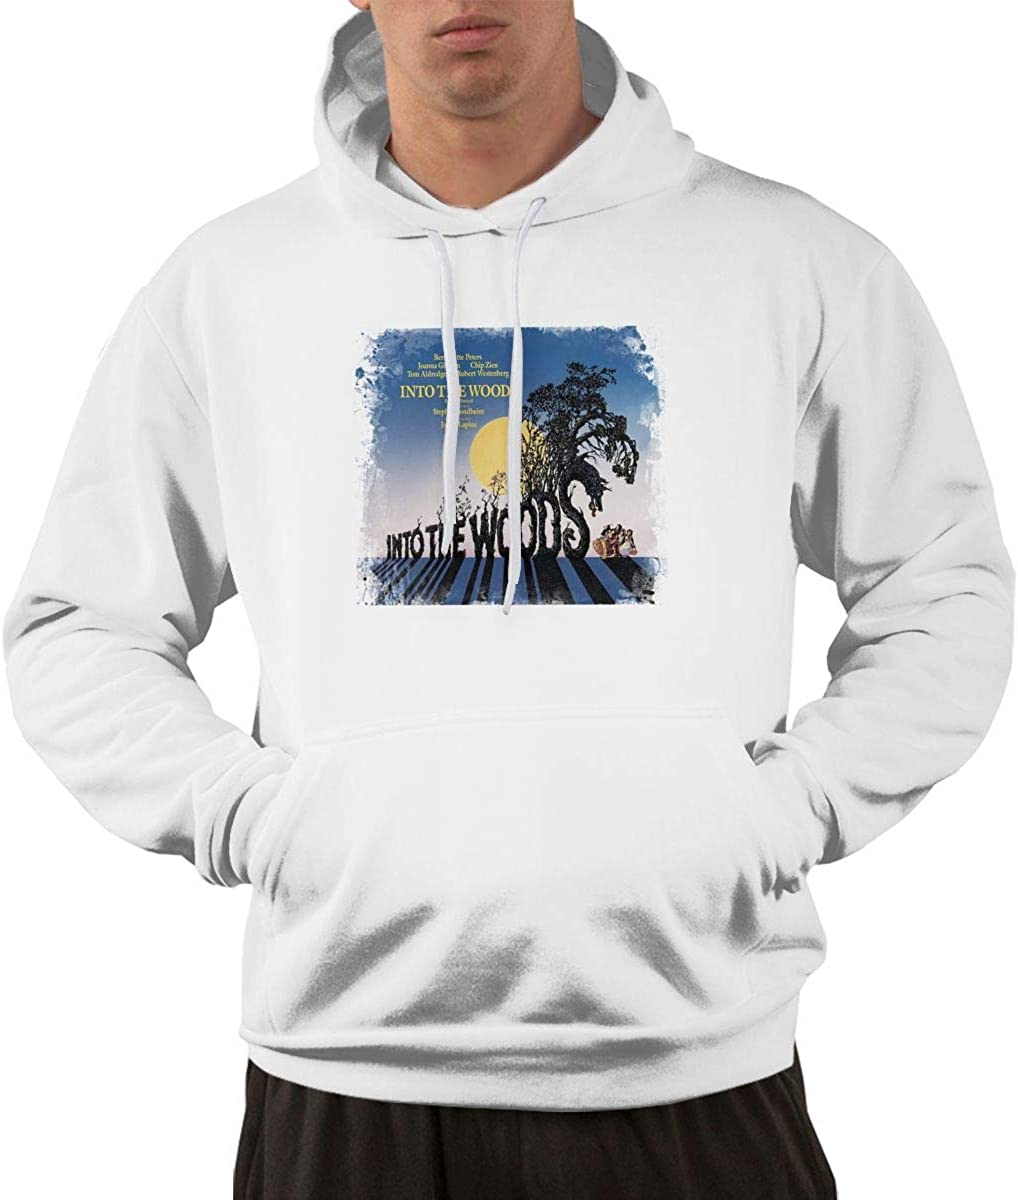 Frank DIY Stephe Sondhei#Int Th Wood Mens Hooded Pocket Sweater